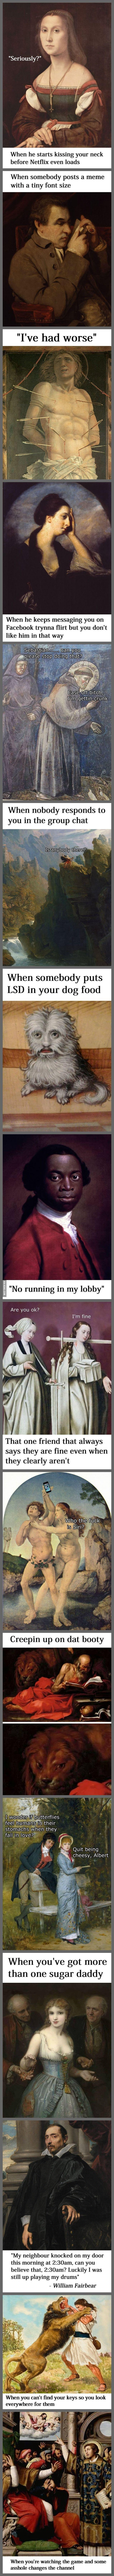 Classical Art Memes Latest (Part-11)